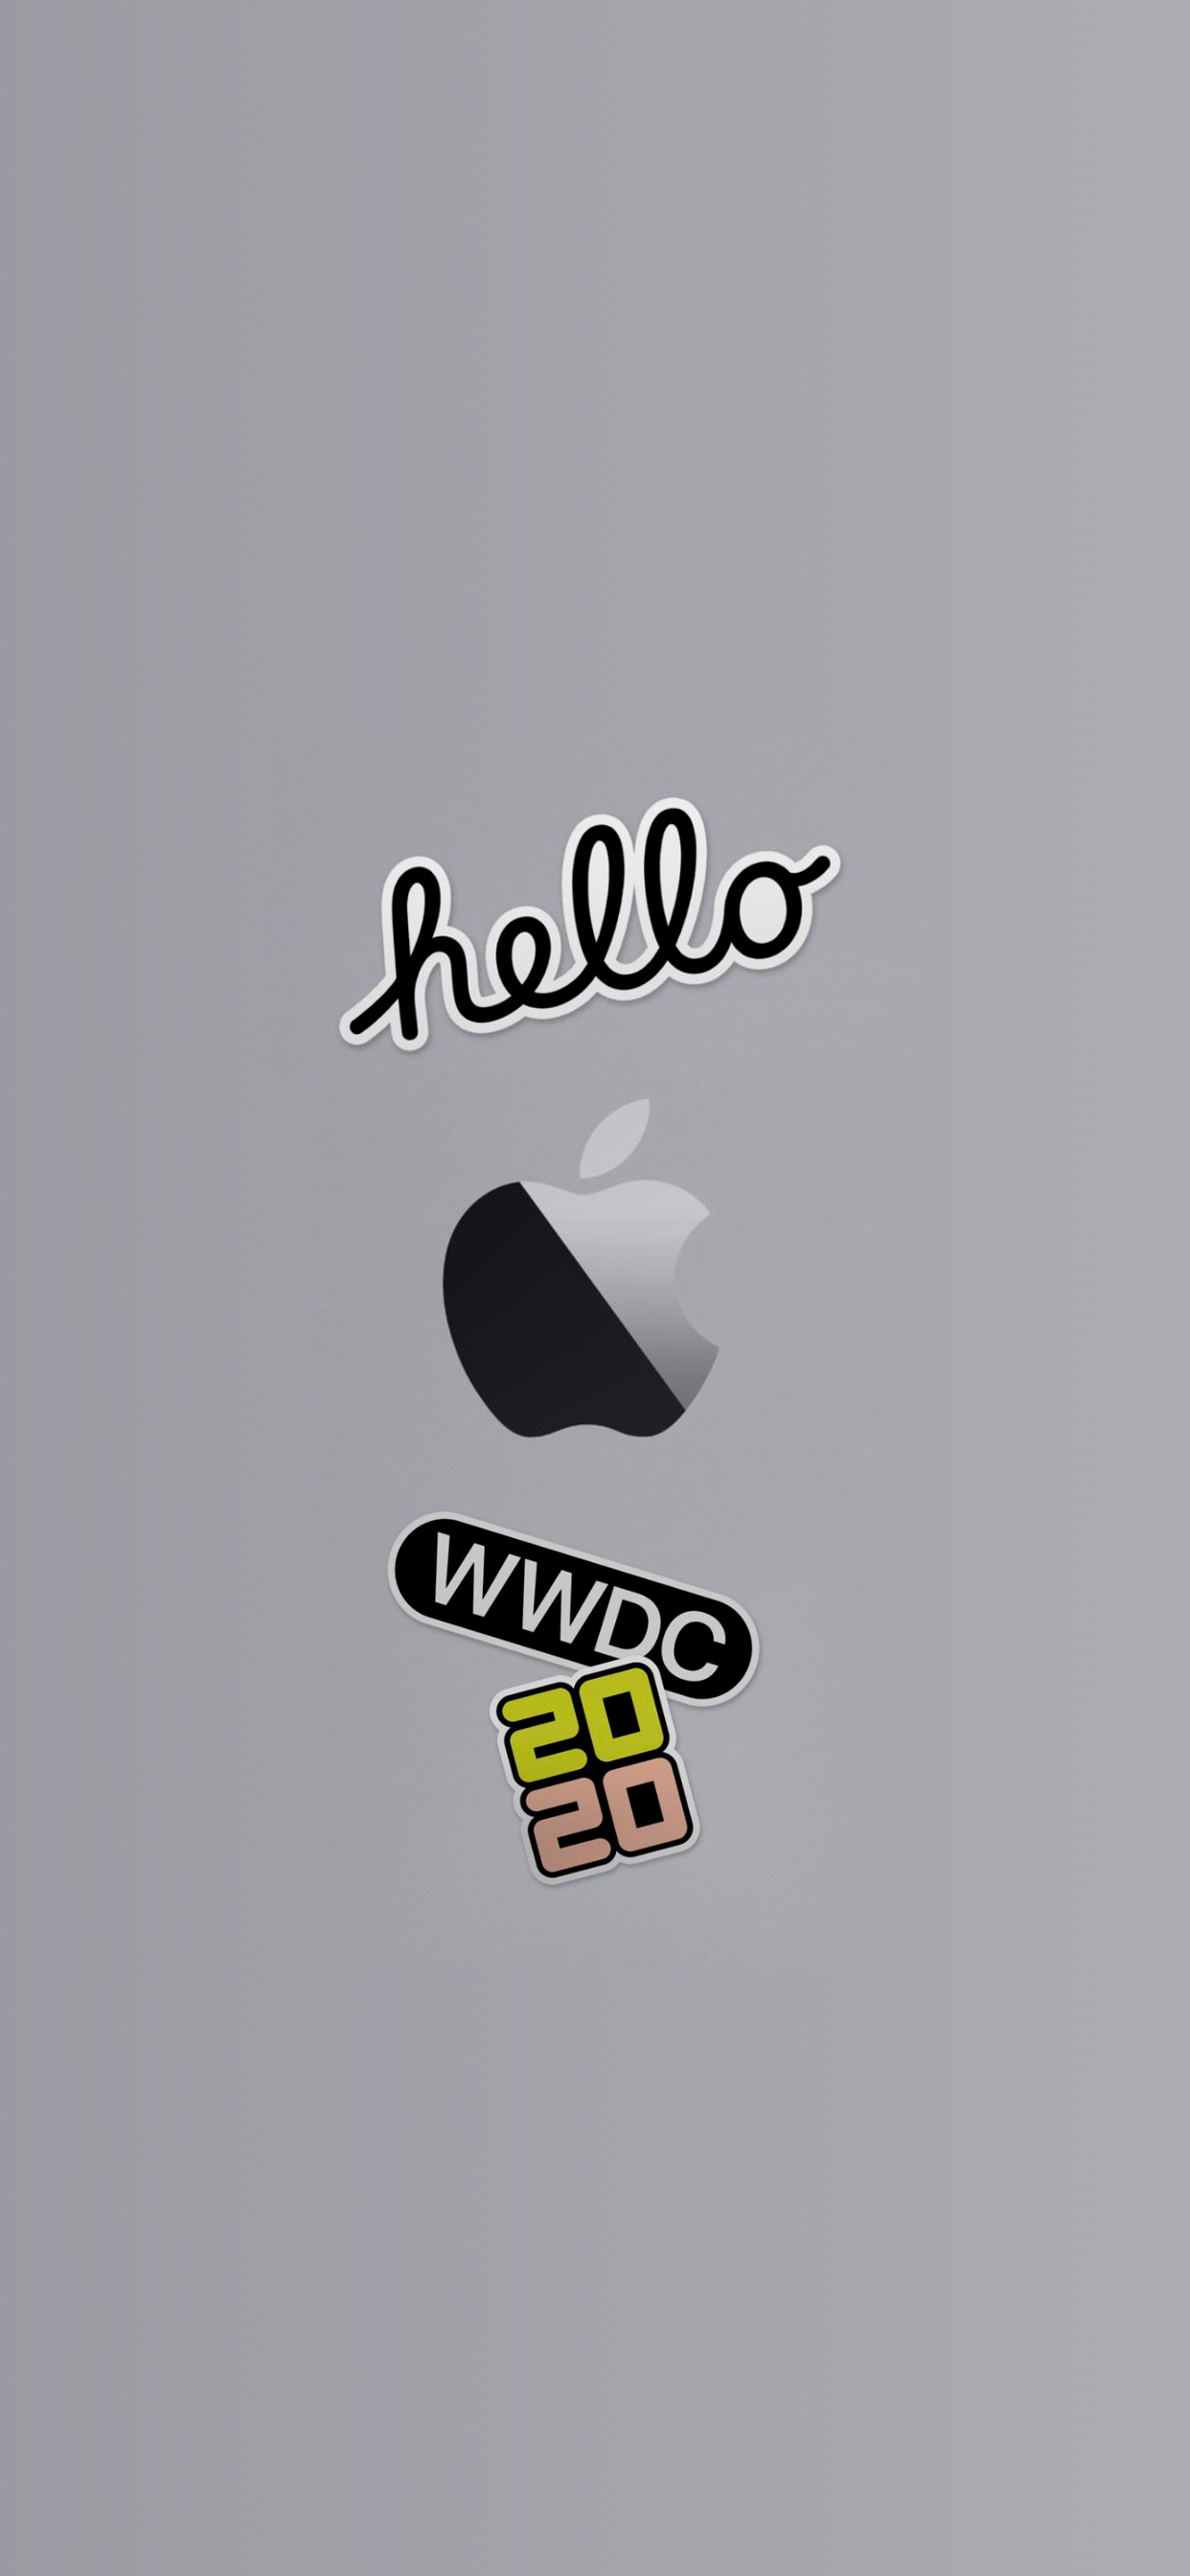 wwdc 2020 wallpaper iphone ar72014 idownloadblog Logos invite gray